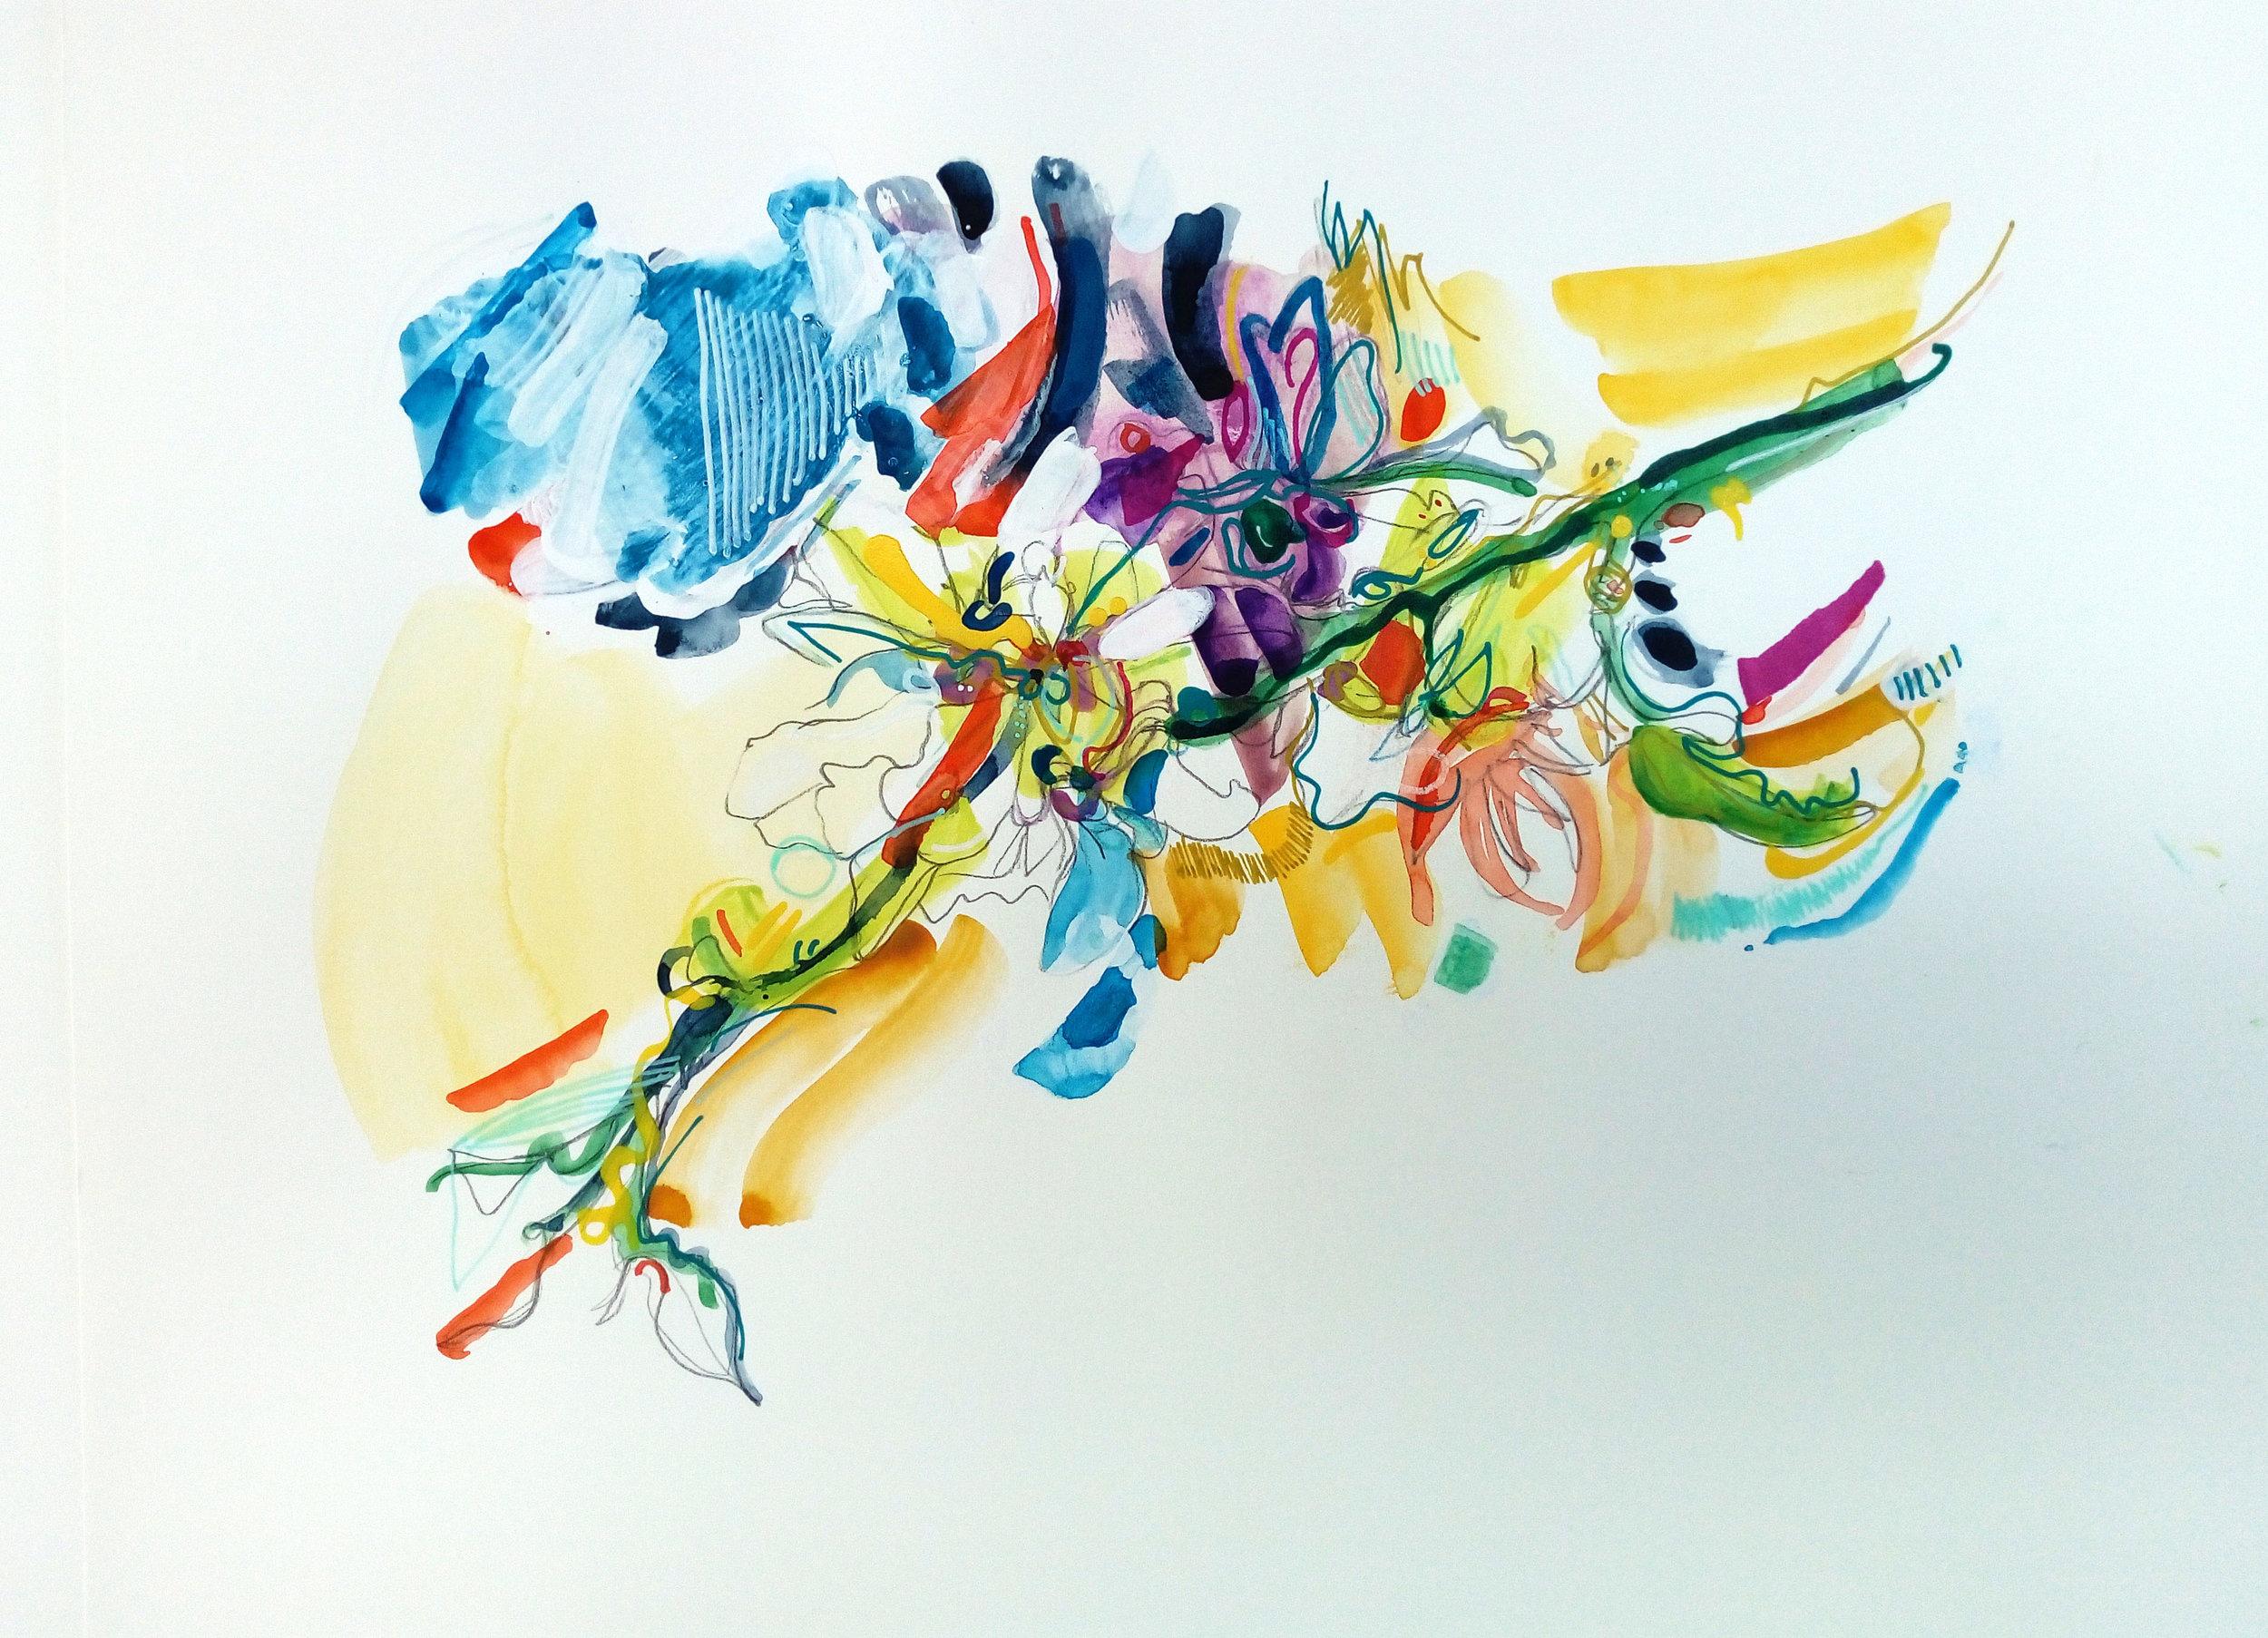 almond blossom marks, watercolour & pen on paper, 34x37cm, april 2019 £220